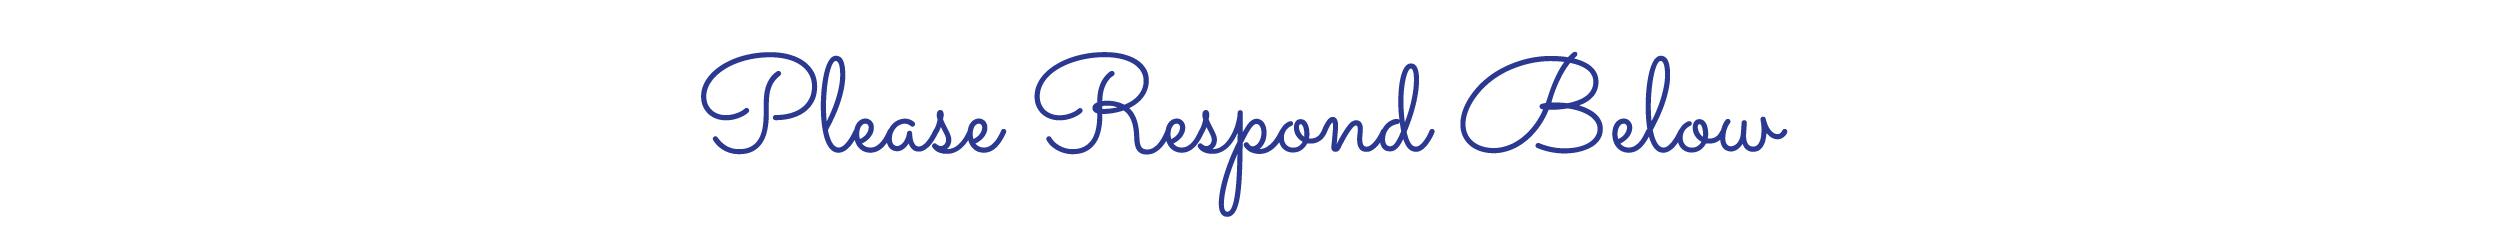 L&C_Web_Title_Please-Respond.jpg